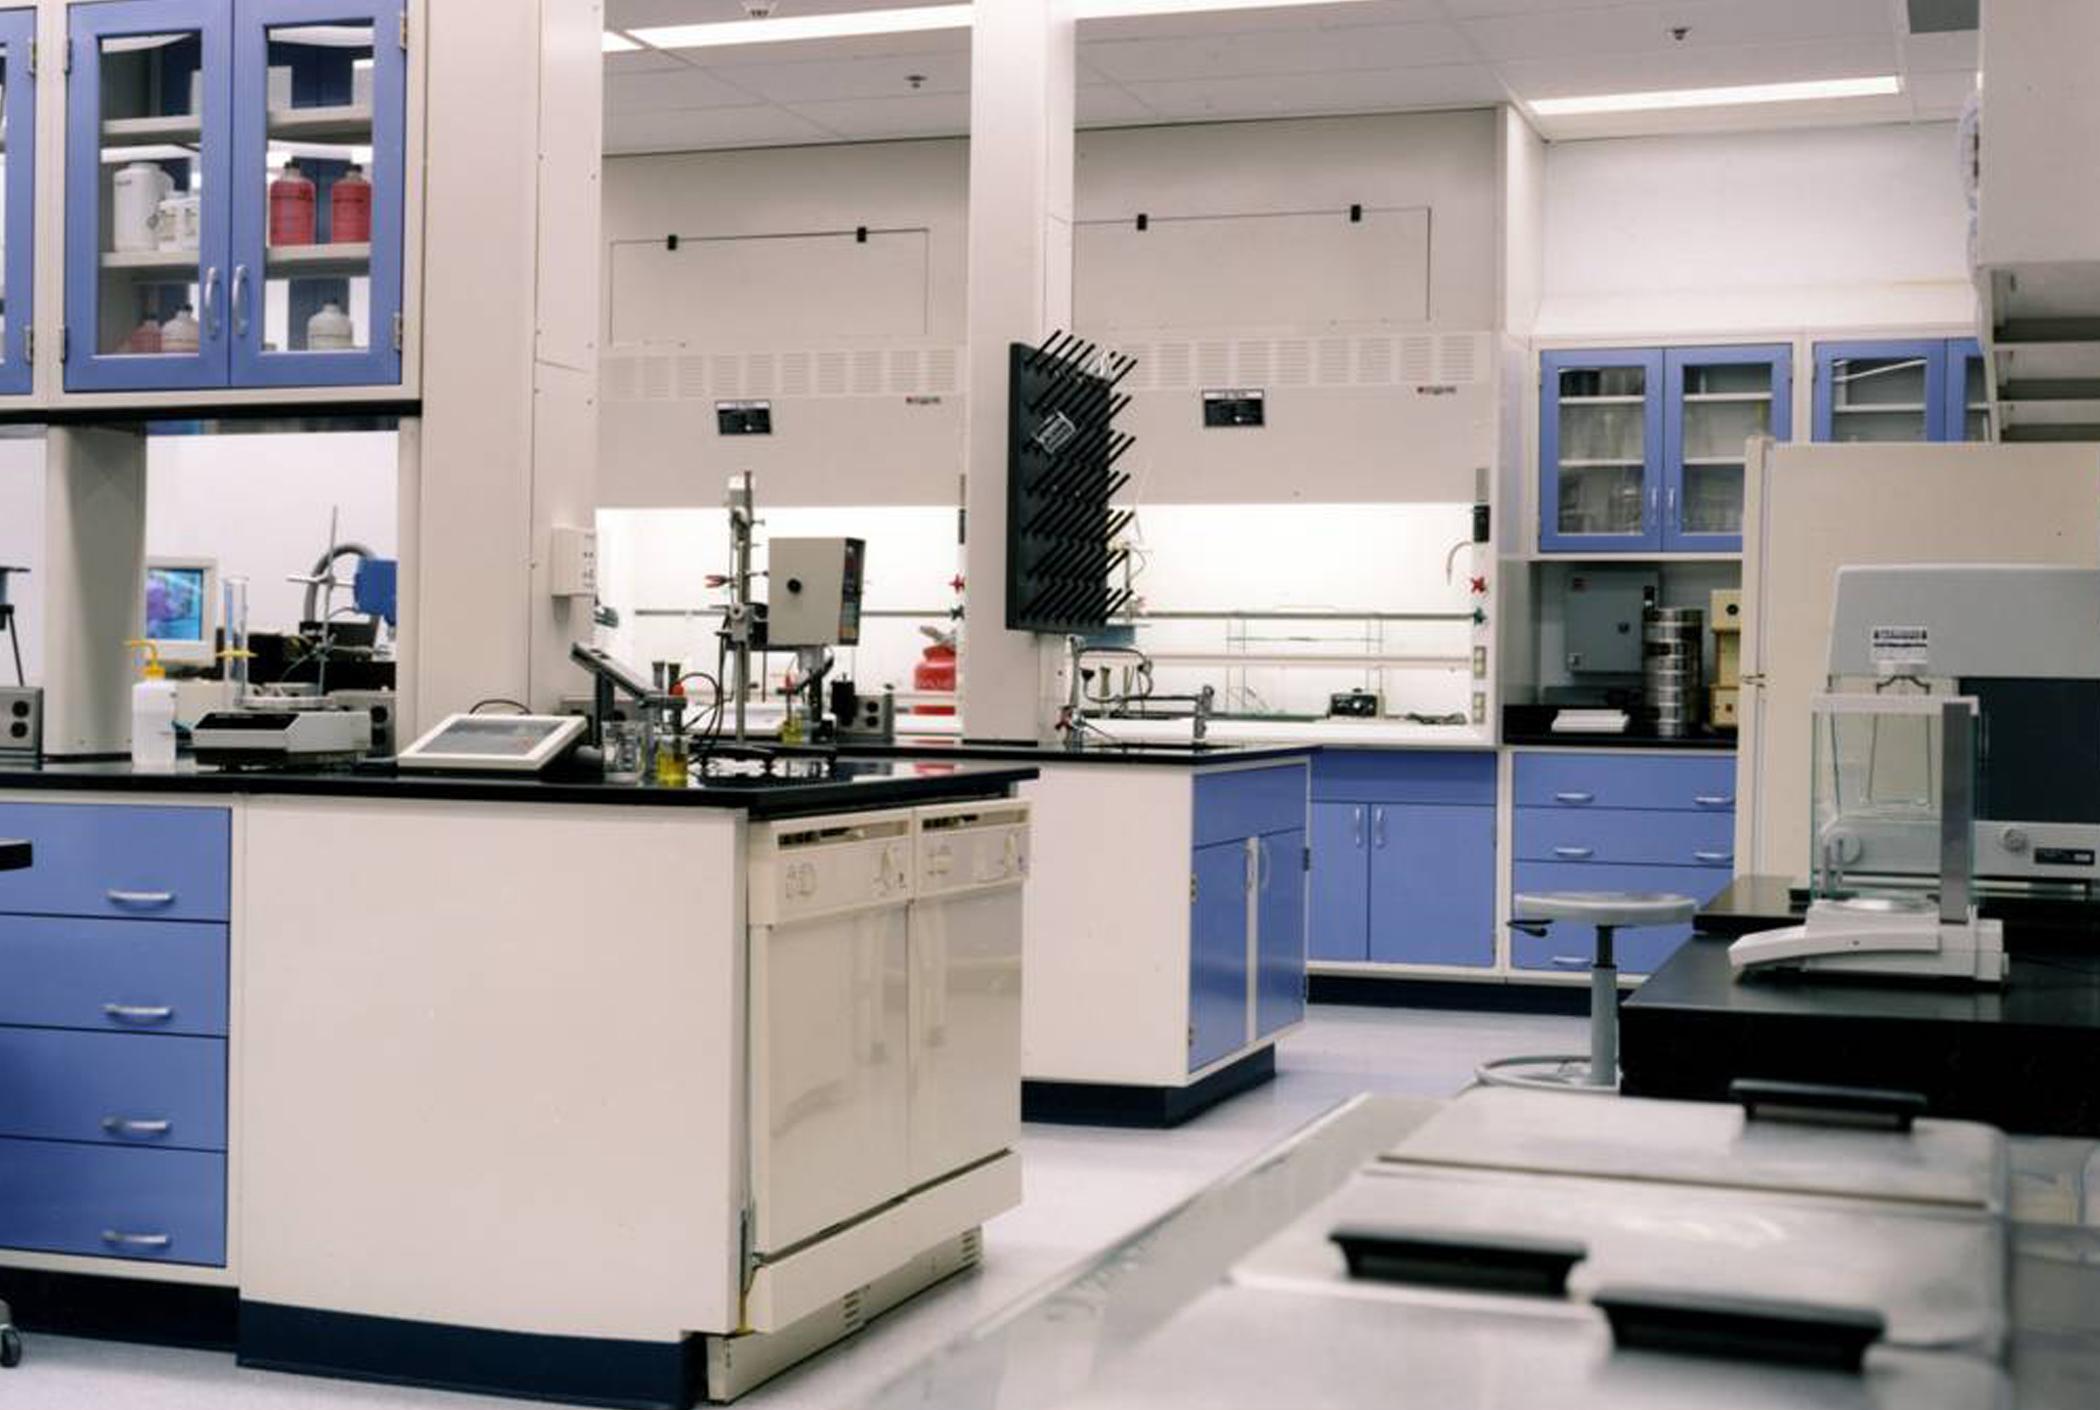 Germantown Lab-300 dpi.jpg